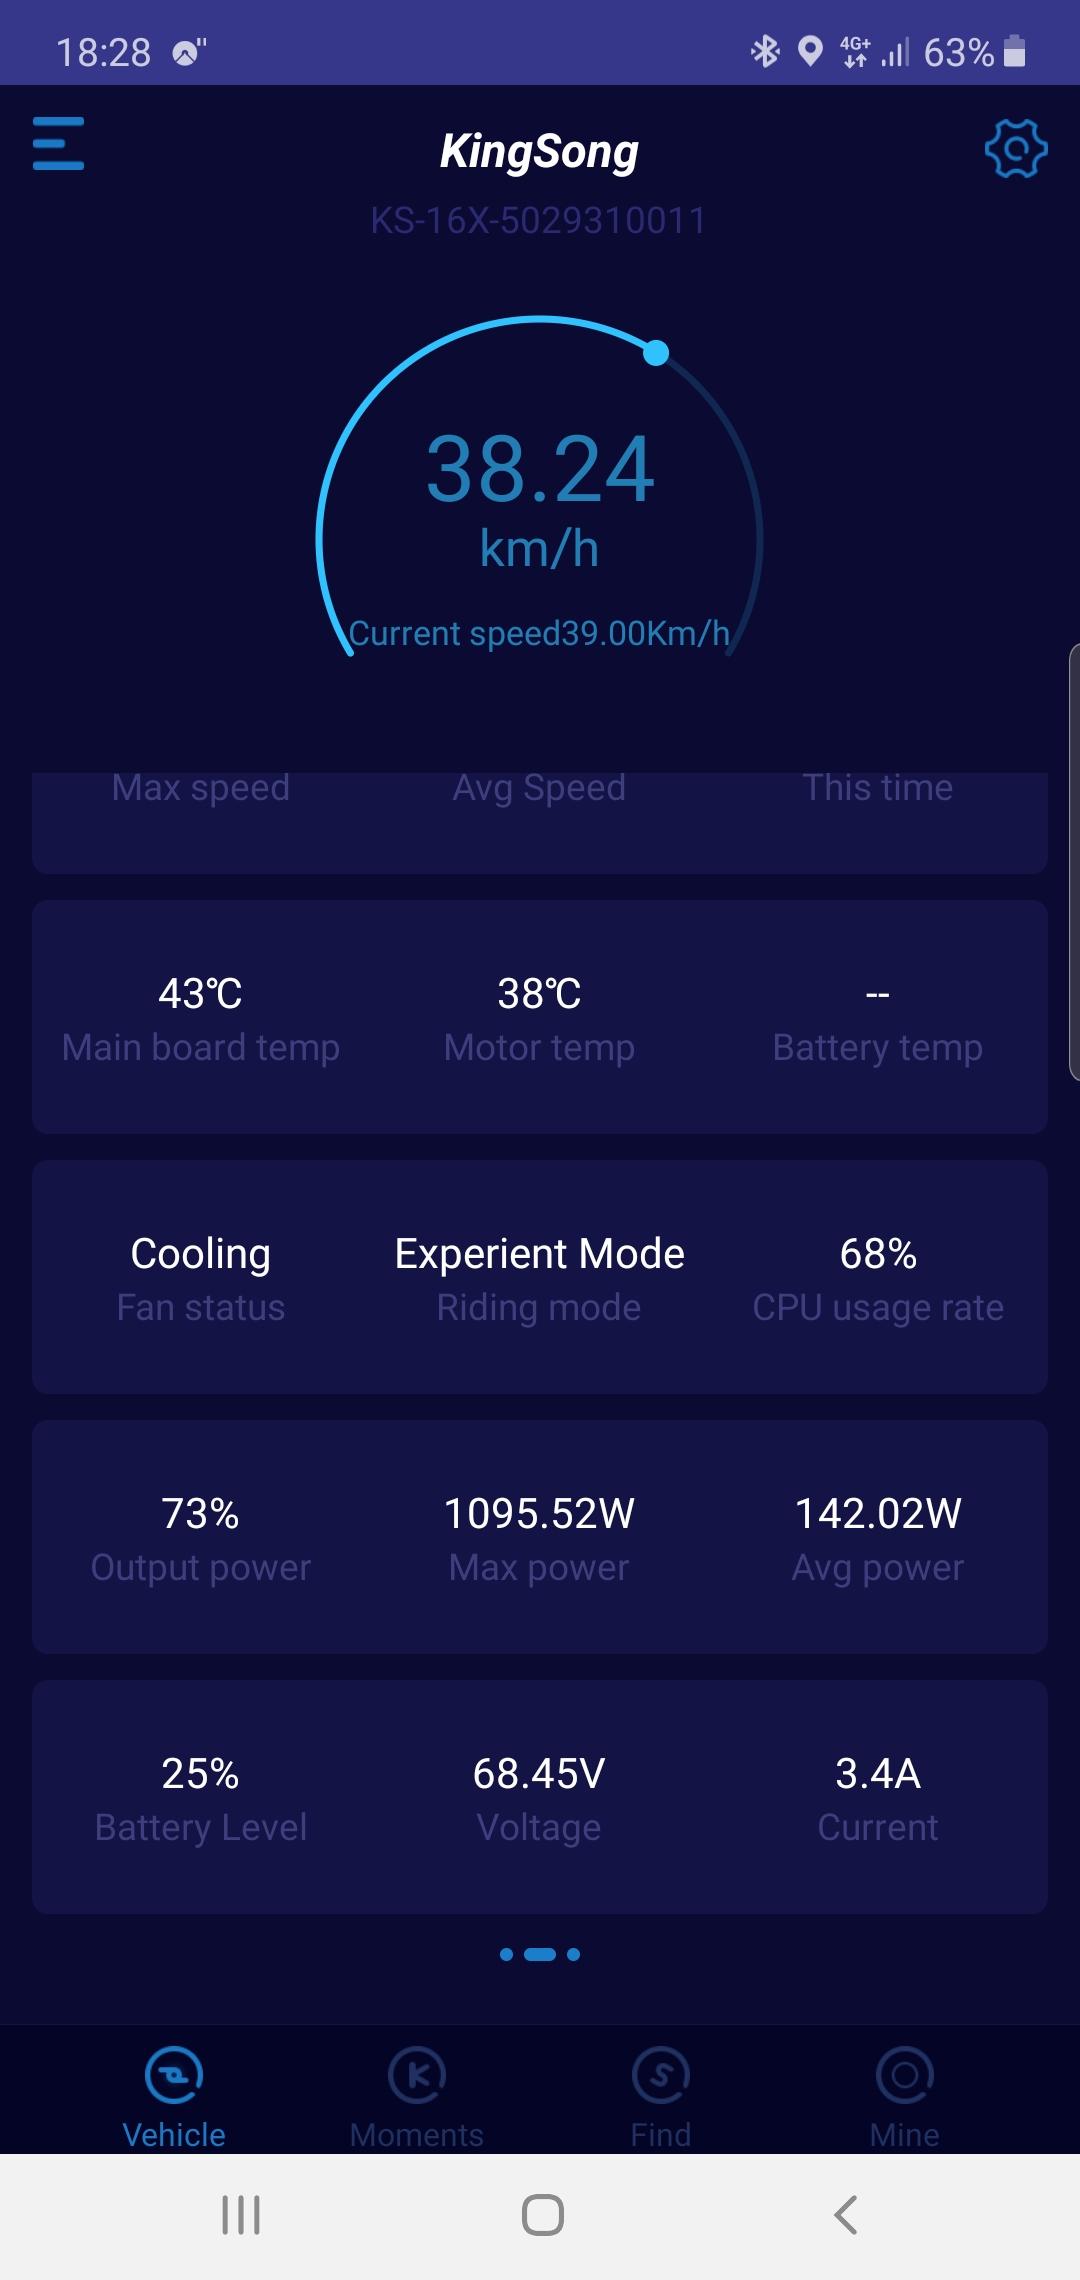 Screenshot-20191001-182833-Kingsong.jpg